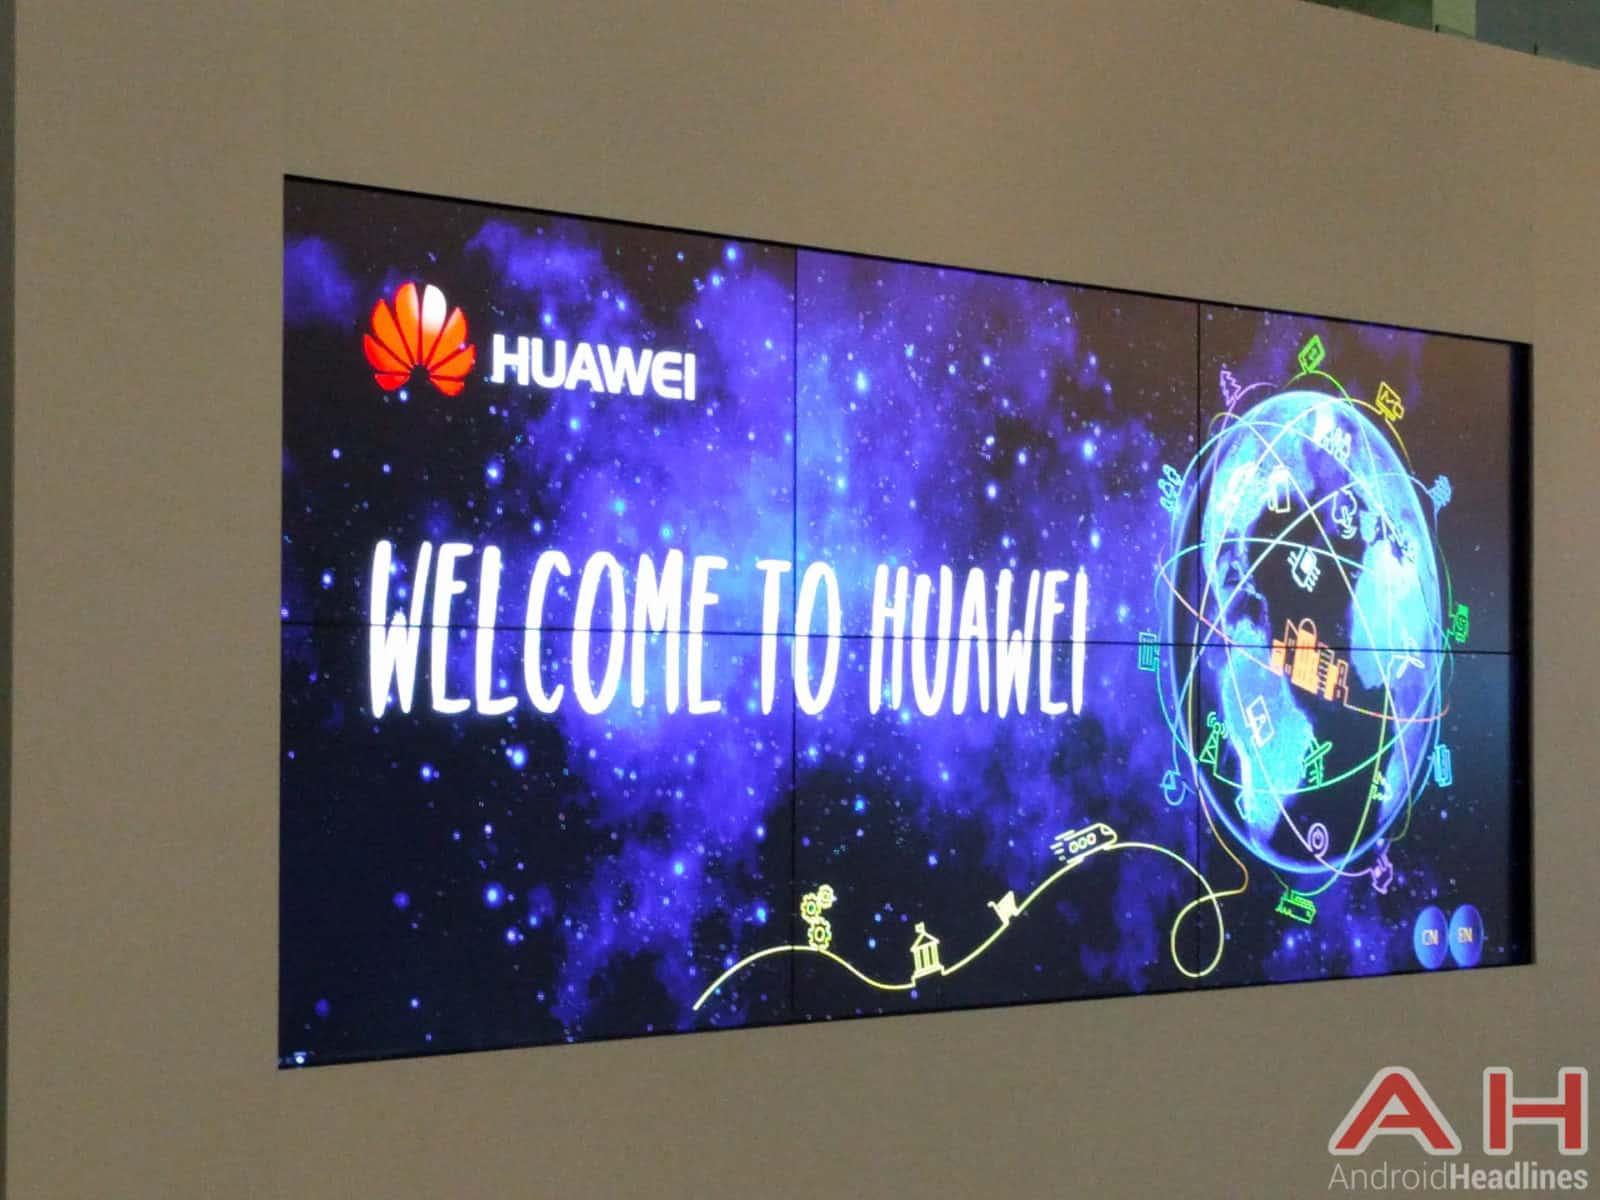 Huawei-Experience-AH-5